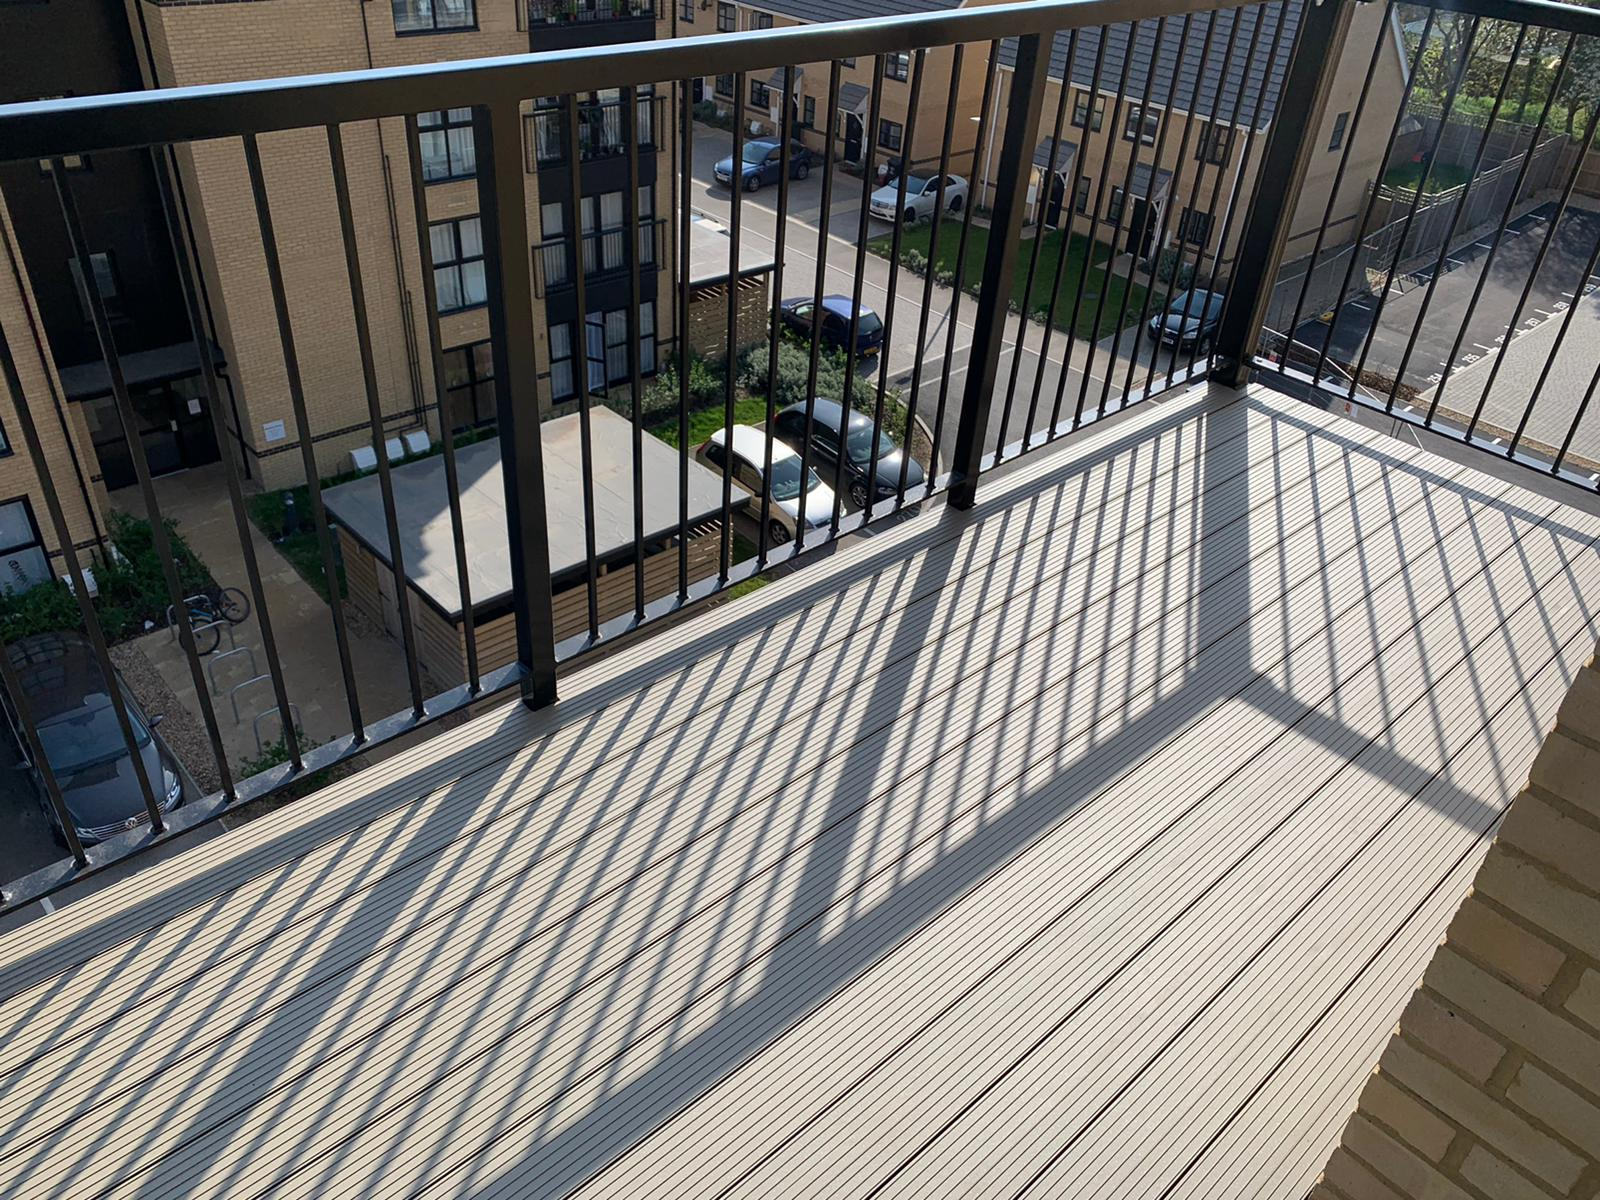 AliDeck Aluminium Metal Decking Installed on Balcony Project in Stevenage